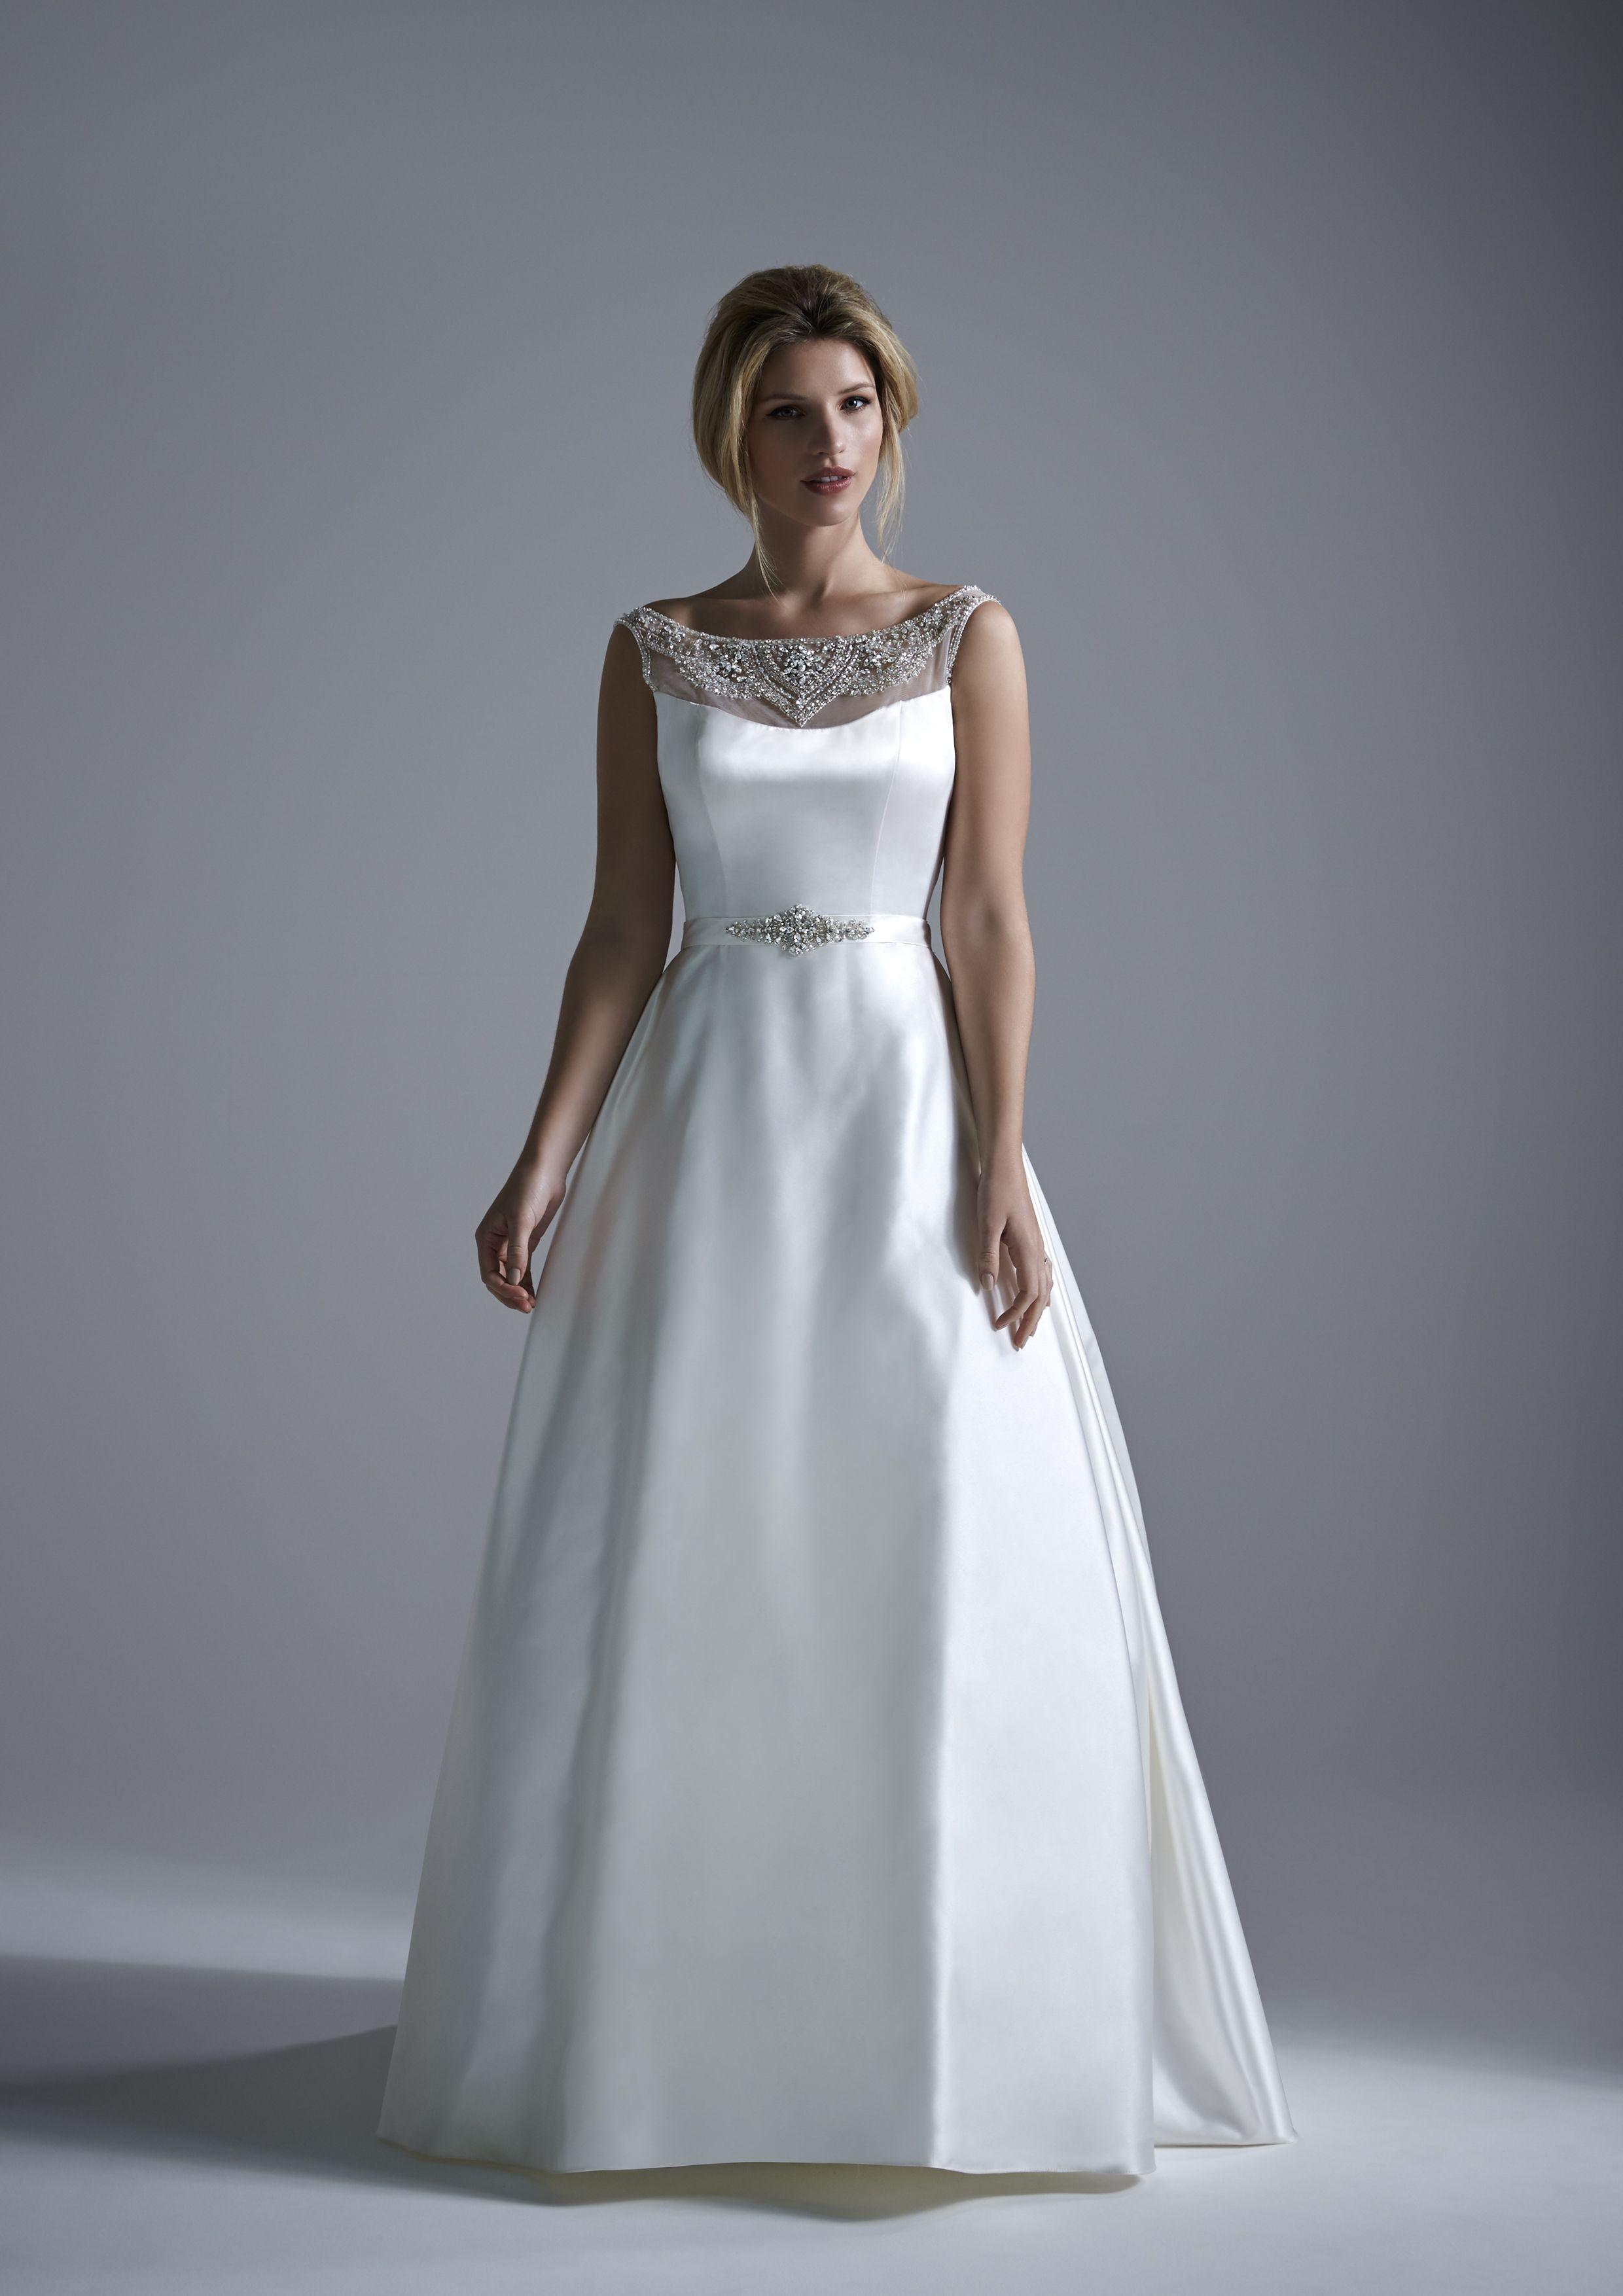 Hardwick a modern satin wedding dress with beaded illusion